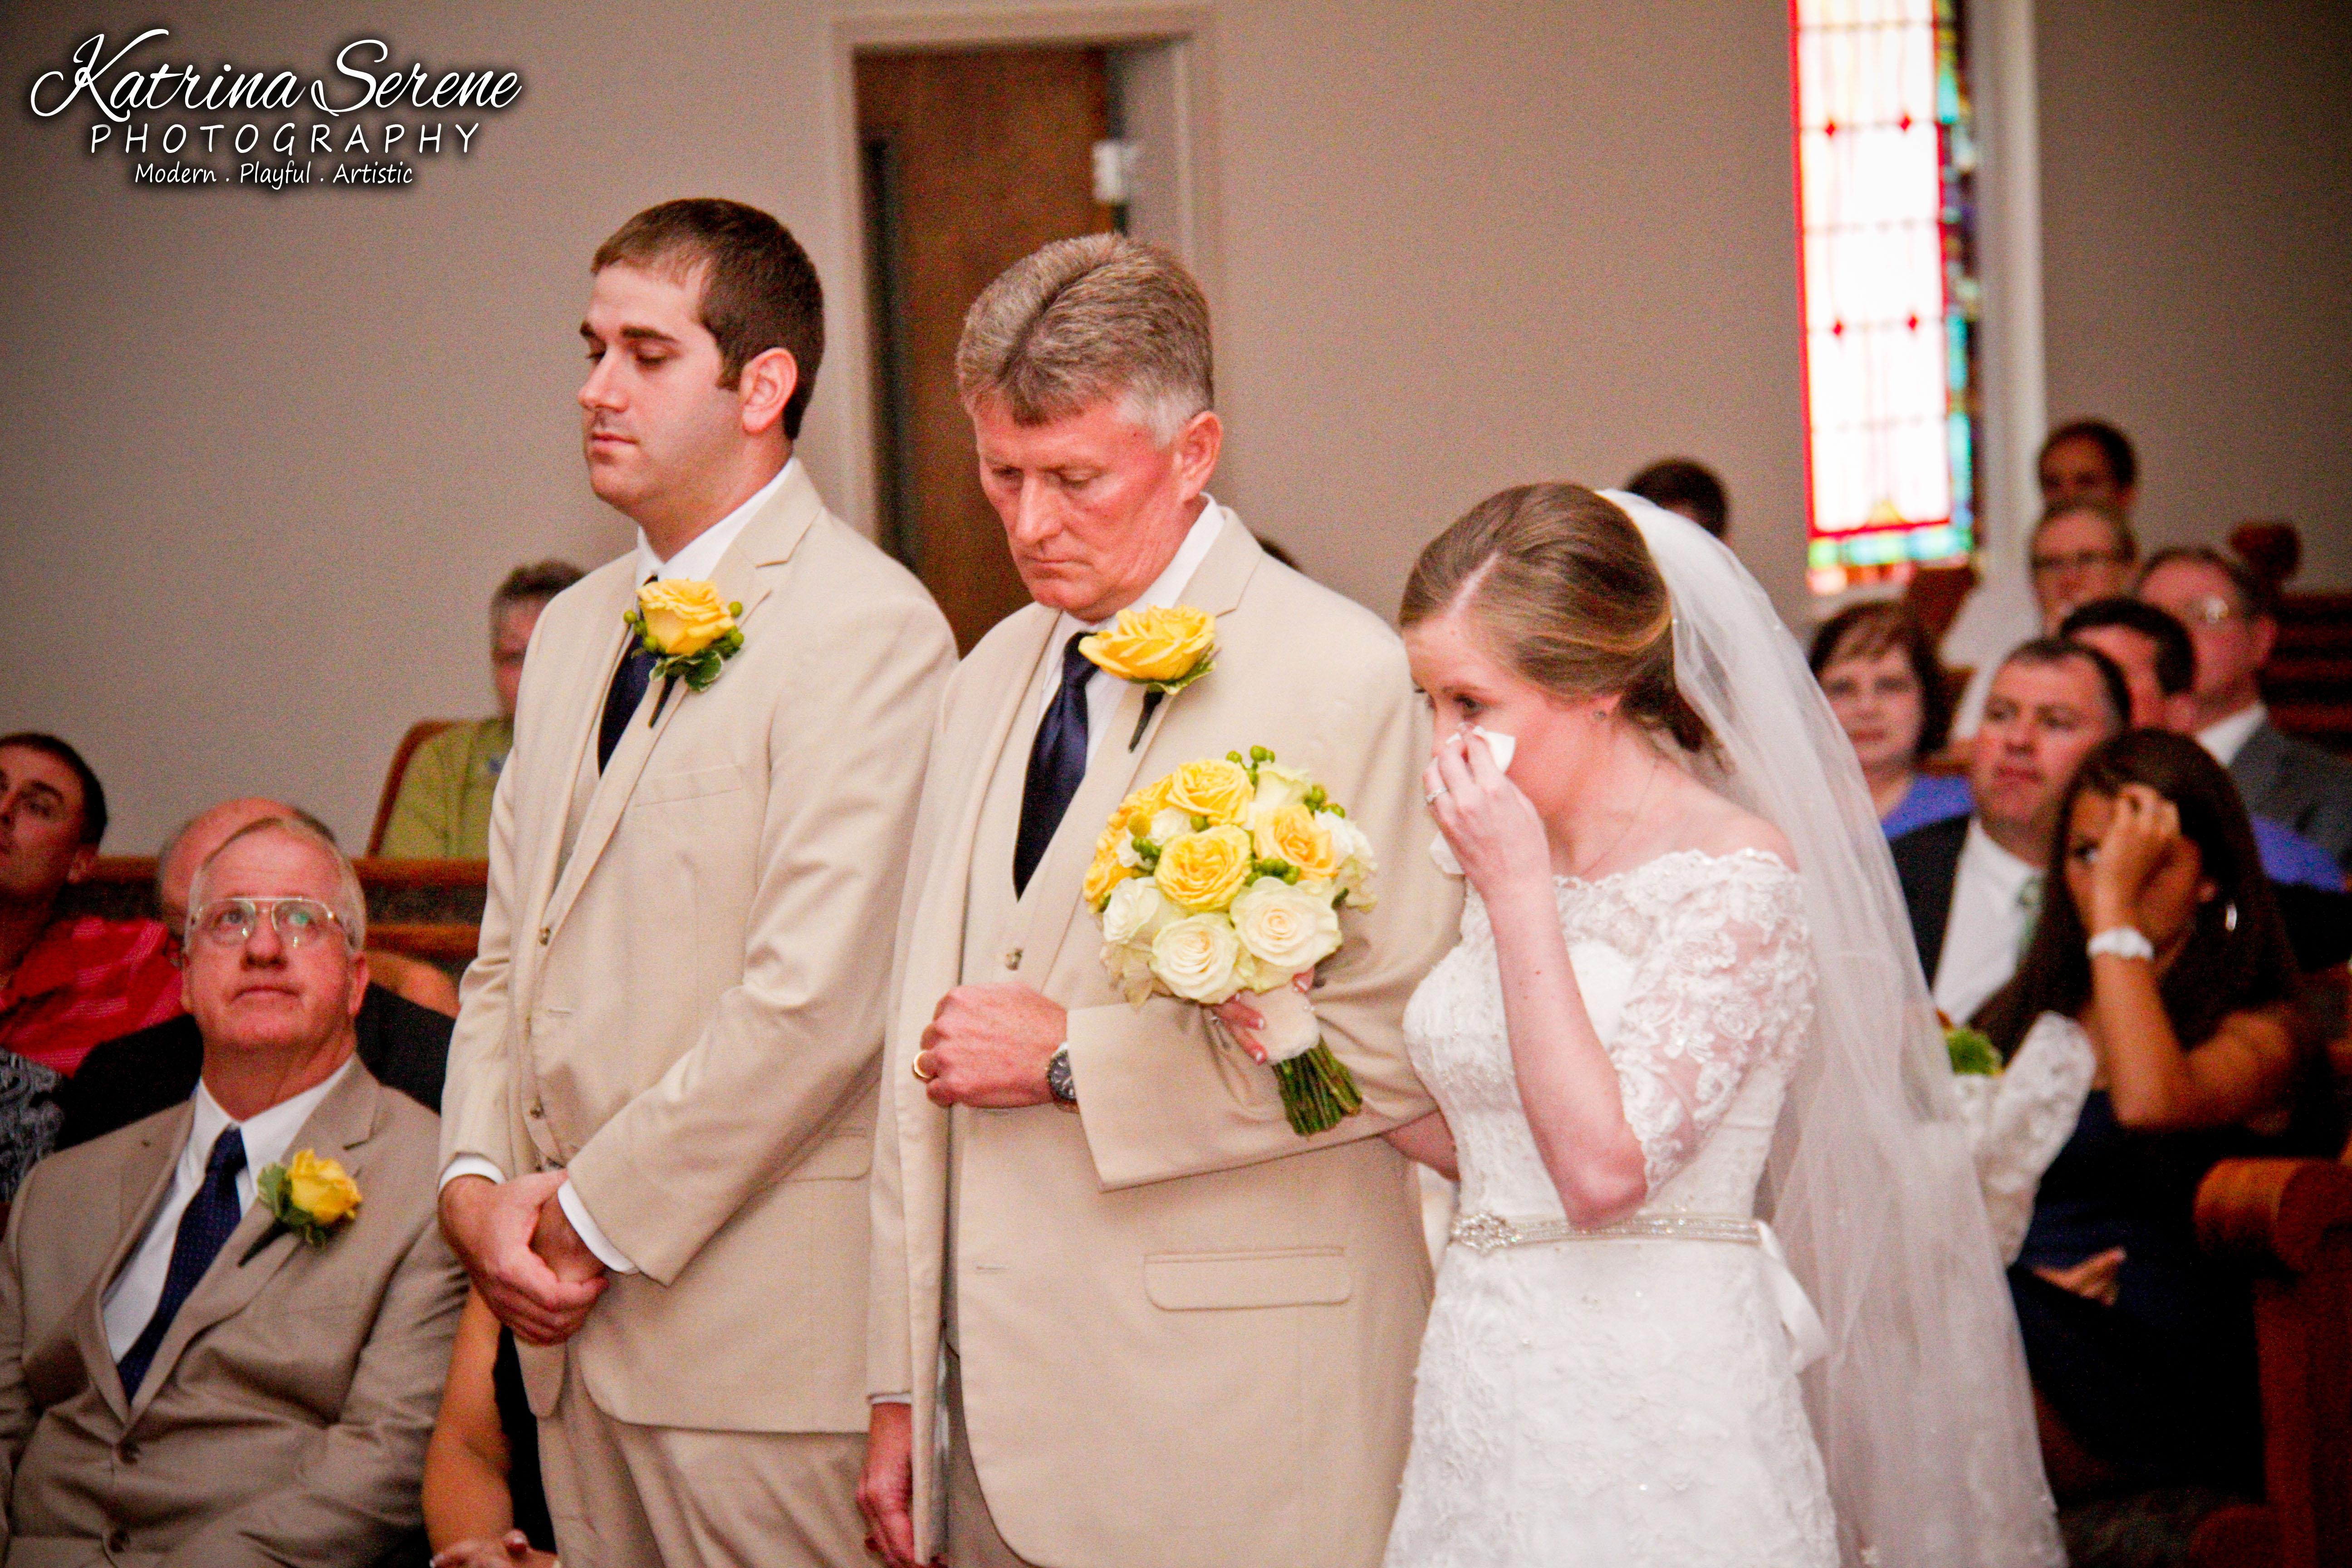 hilary andrew simple elegant wedding � katrina serene